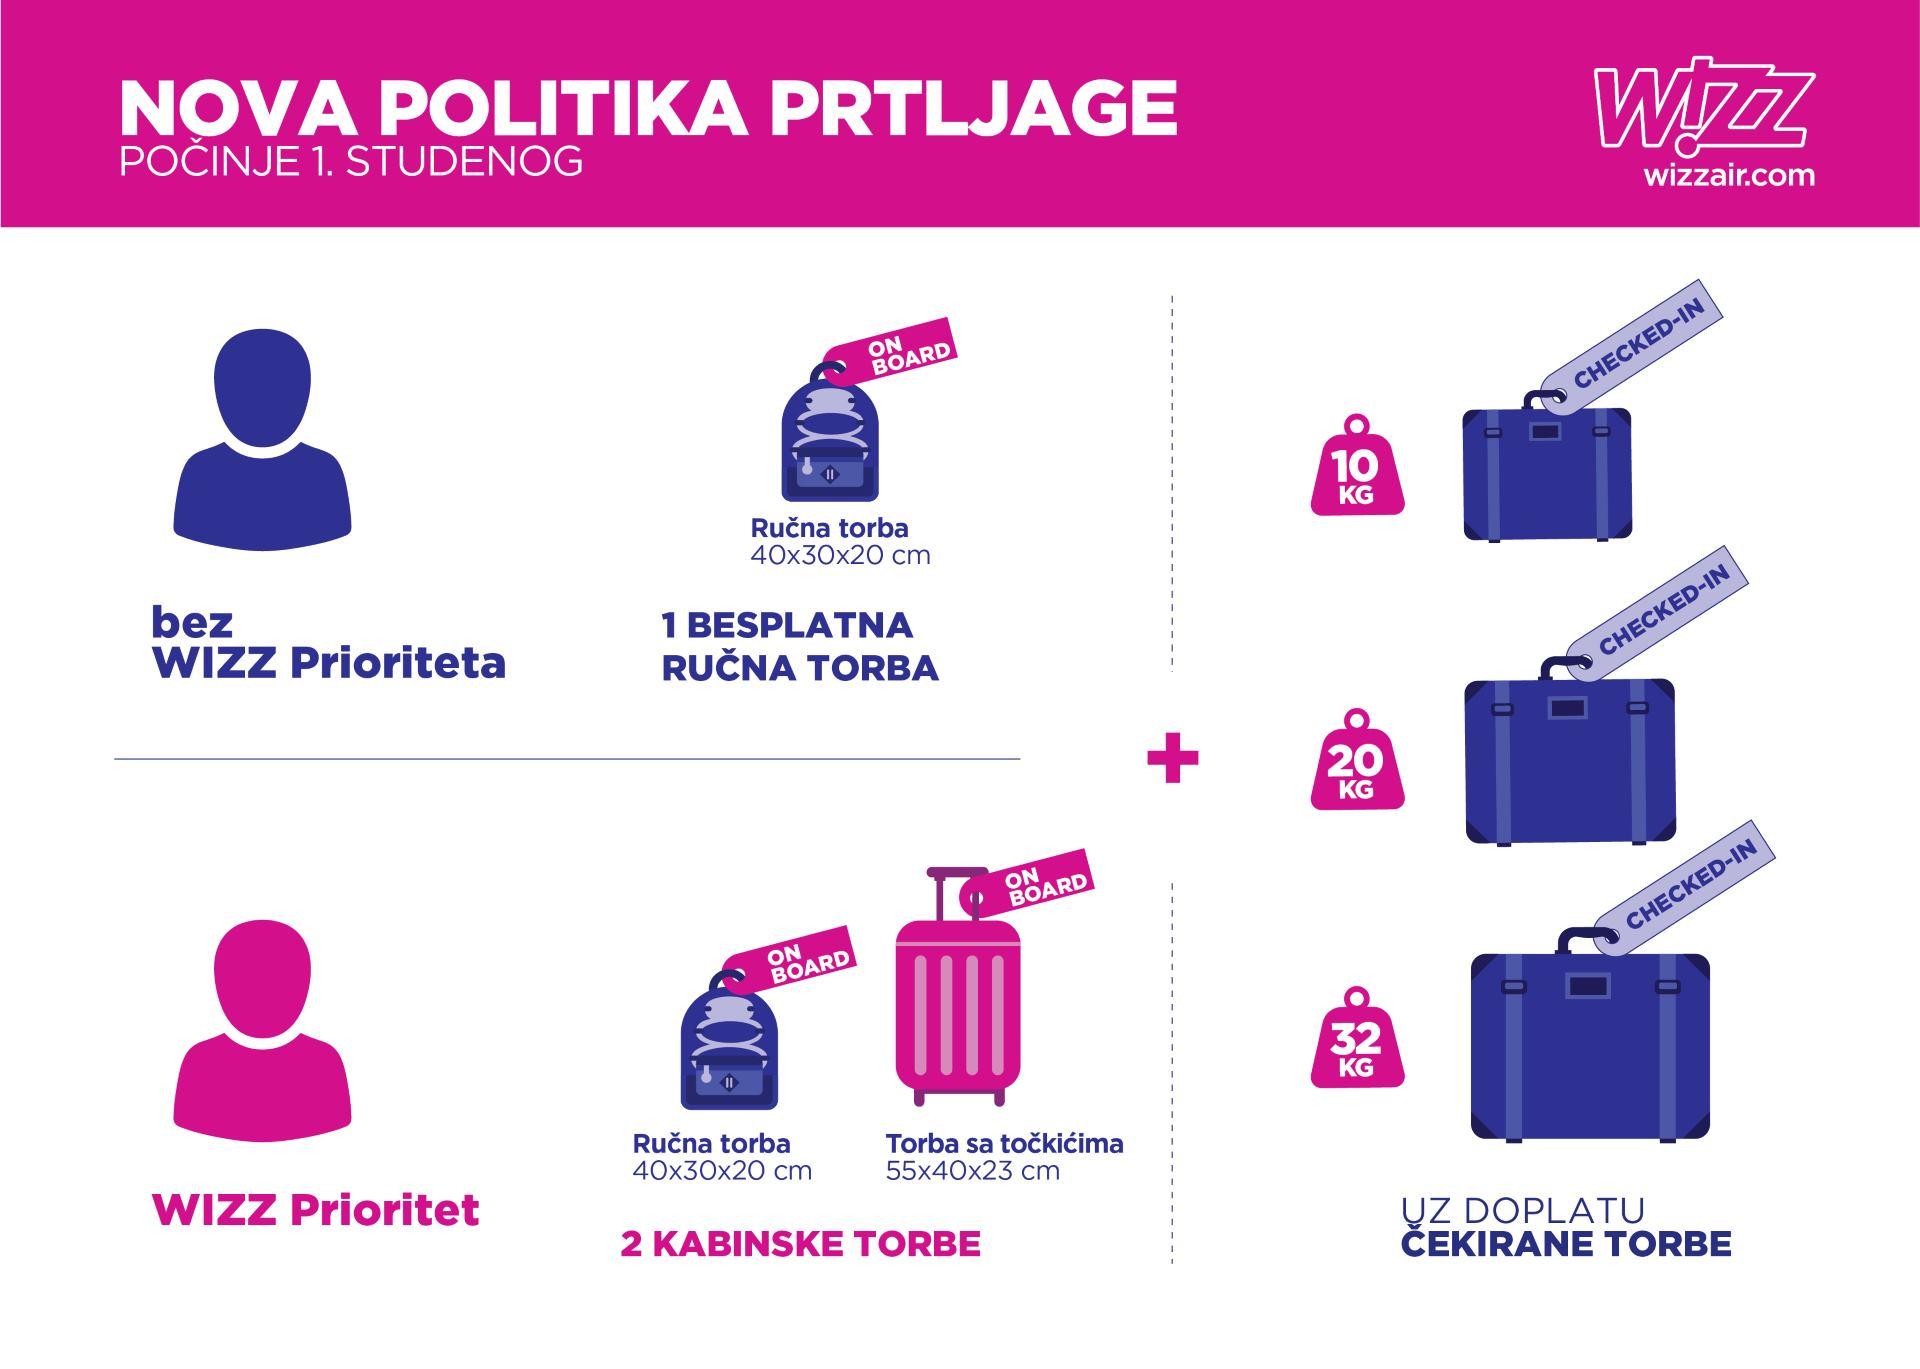 Wizz Air predstavlja novu i transparentnu politiku prtljage